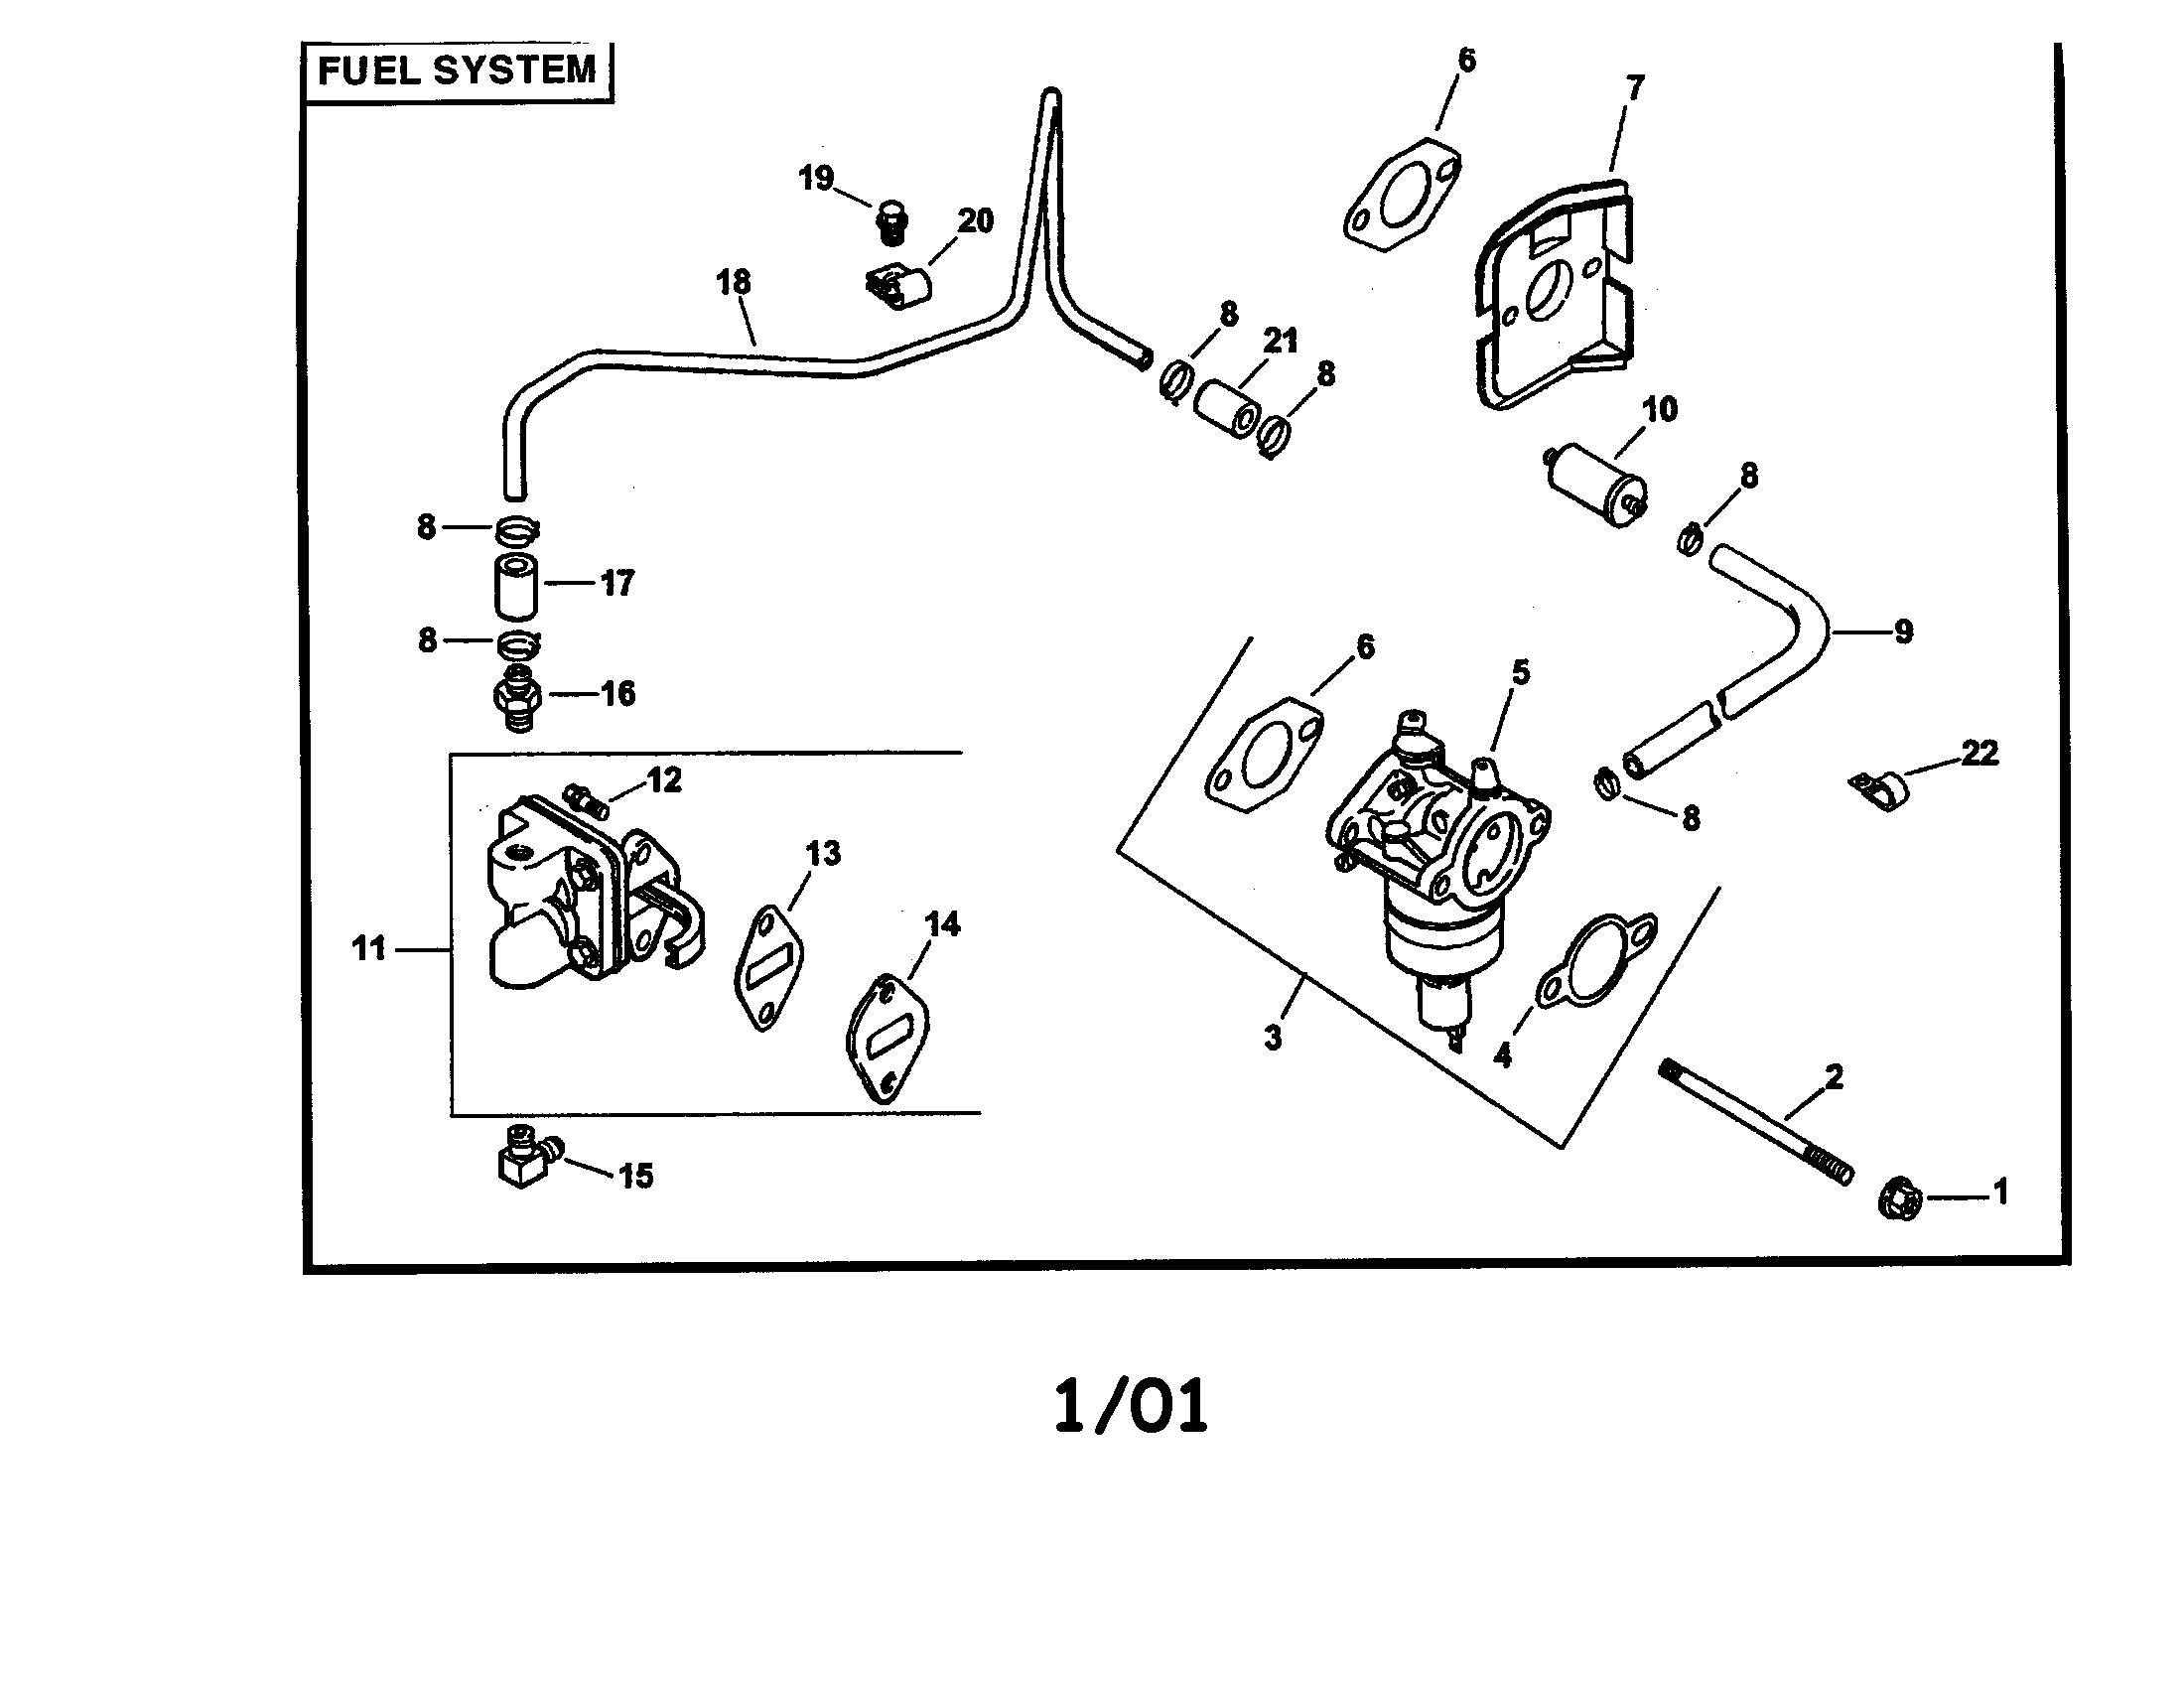 Engine Kohler Part Fuel System, Engine, Free Engine Image